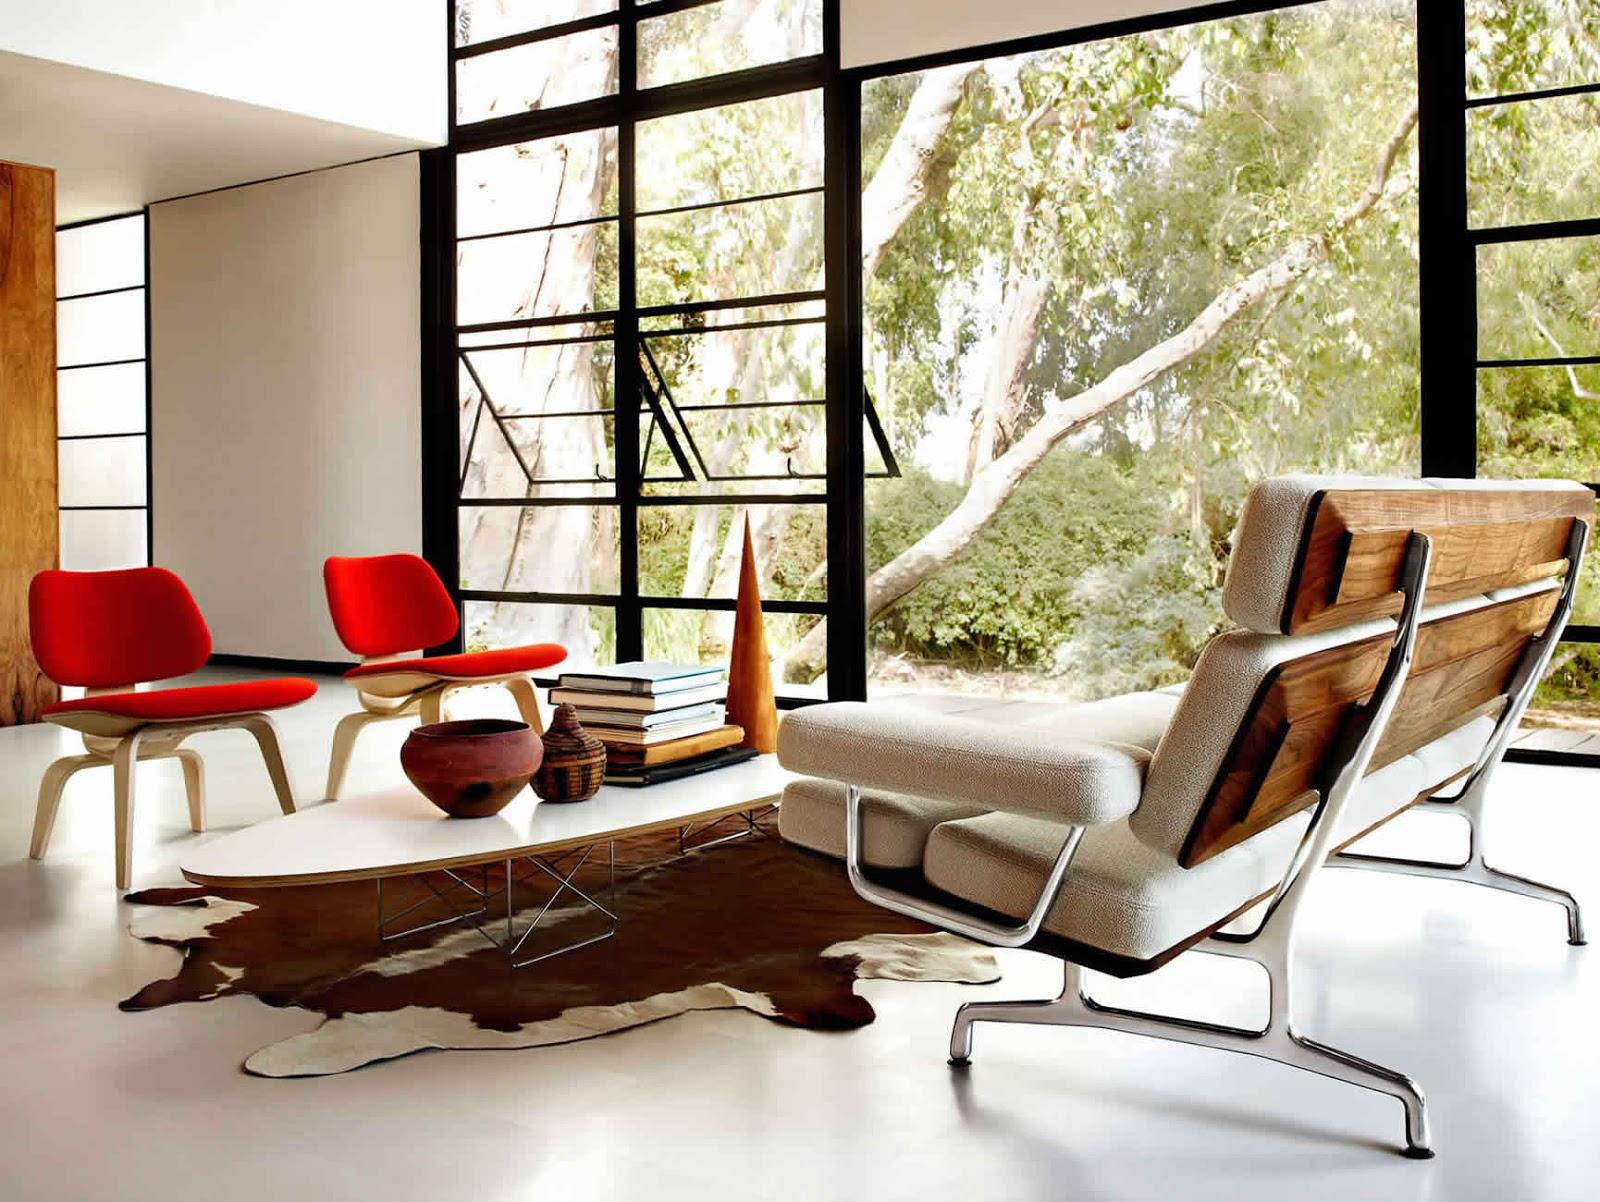 Okokno Herman Miller Furniture